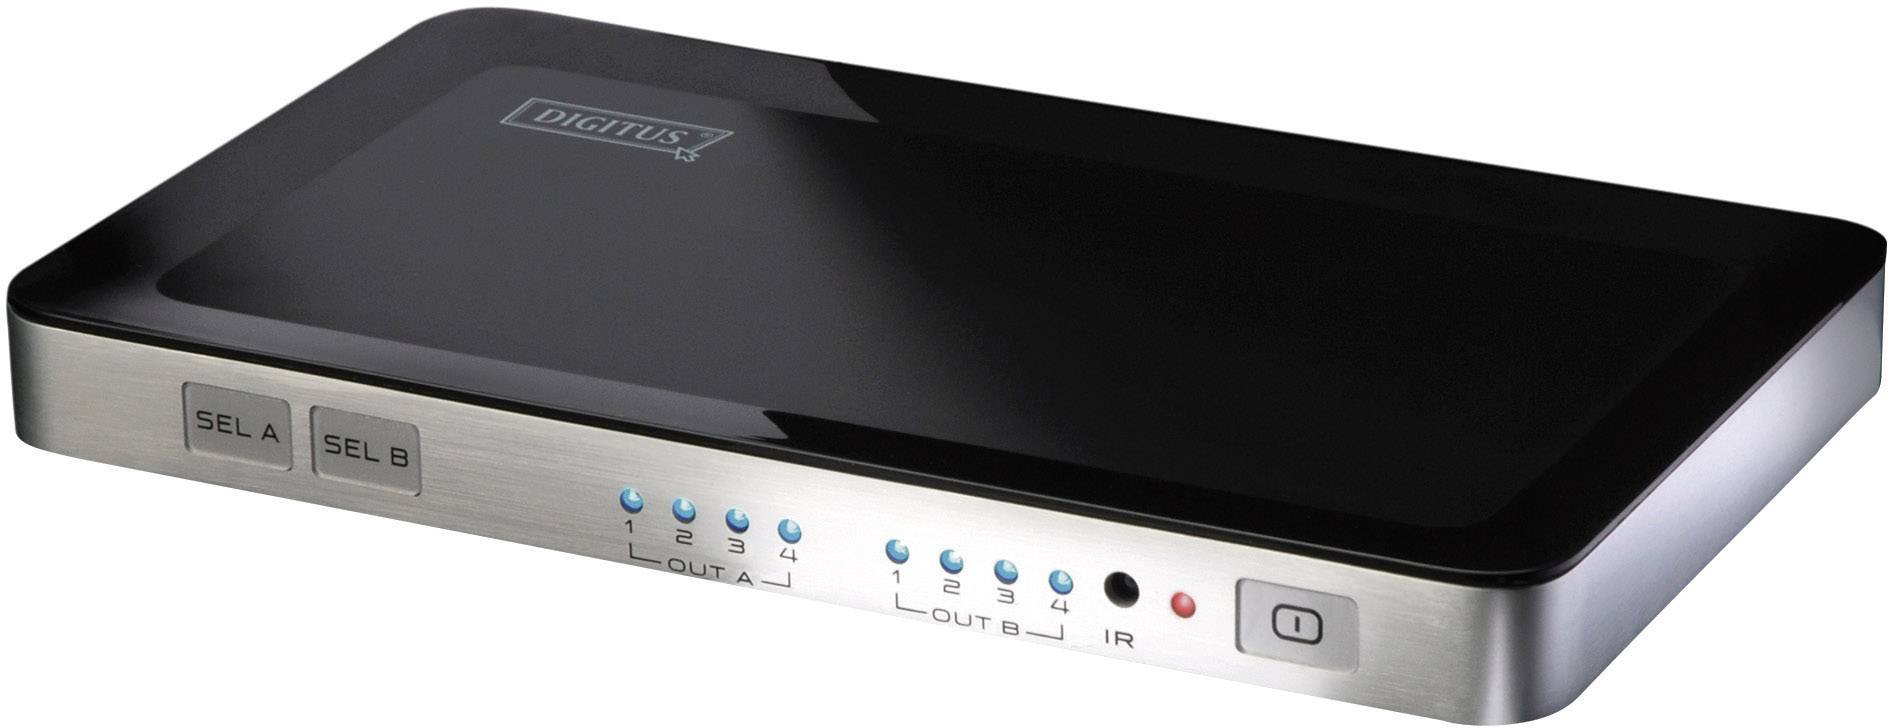 HDMI matrix switch Digitus DS-48300 DS-48300, s 4 portmi